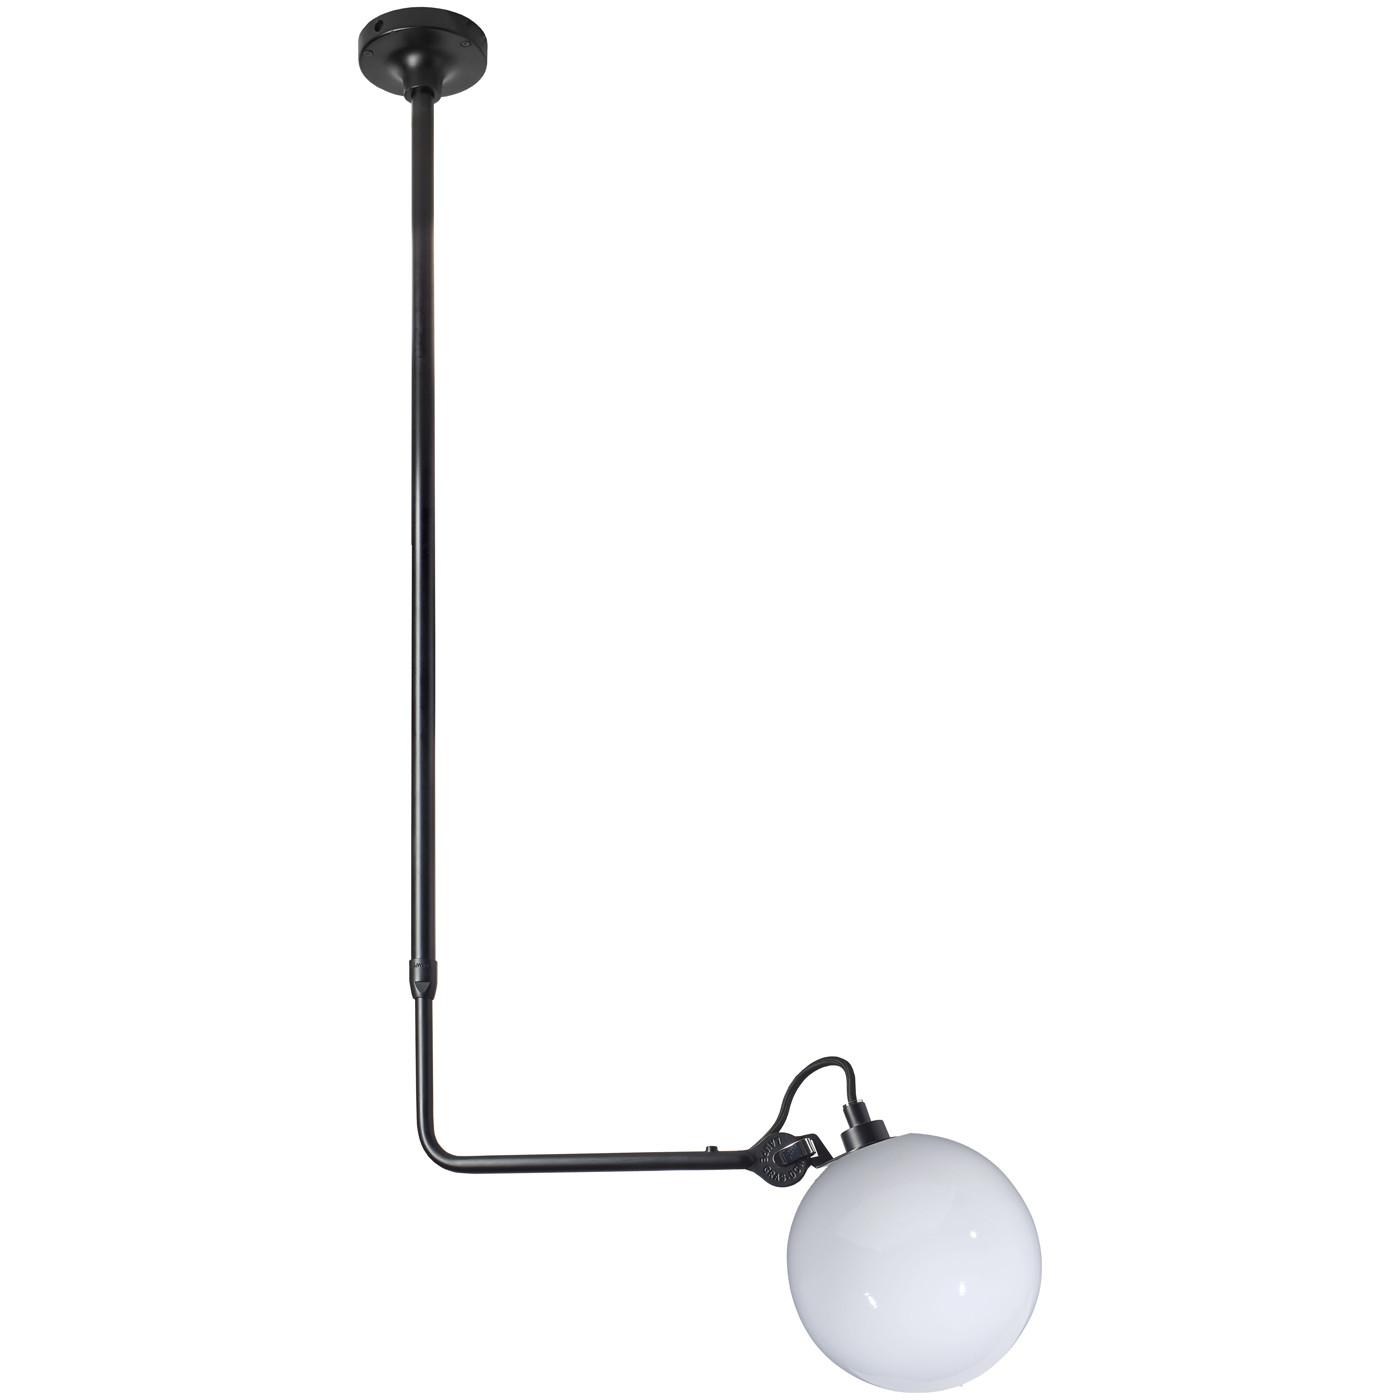 DCW Lampe Gras No 313 Glass Ball 175